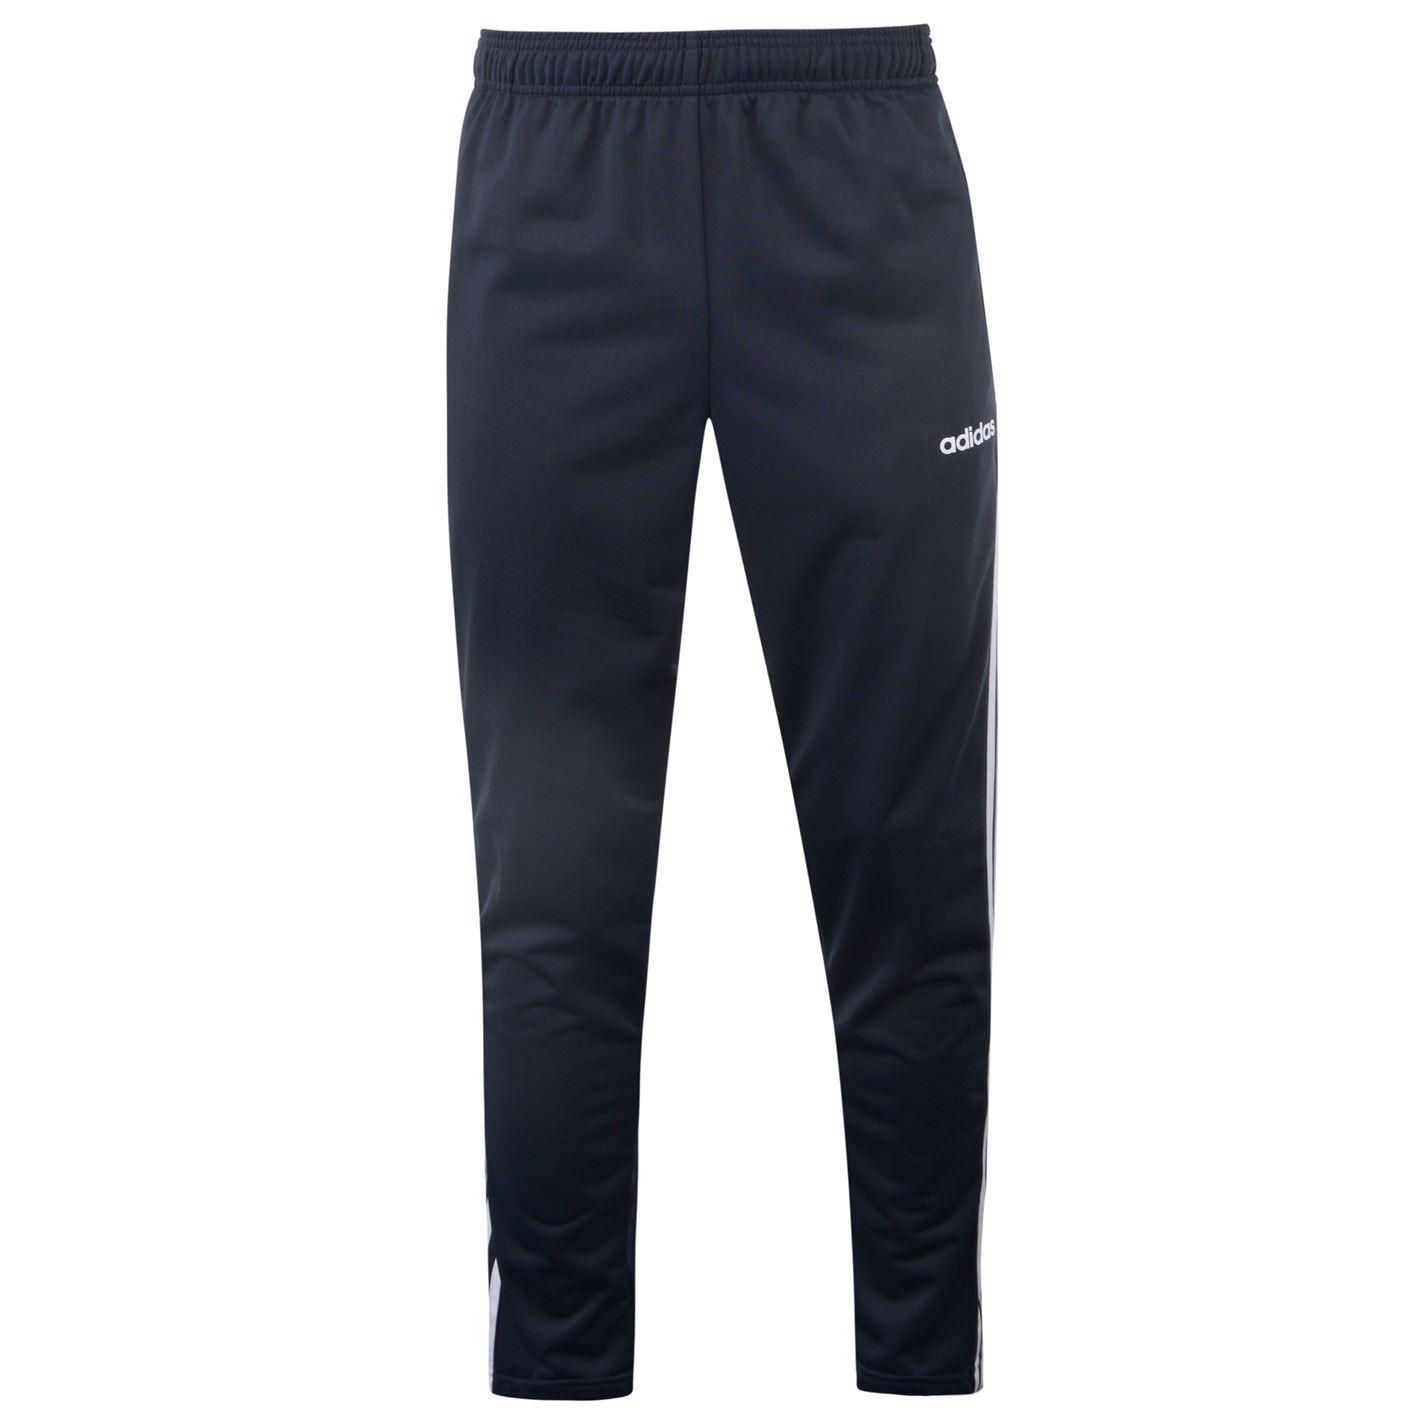 ADIDAS Track Hose Classic 3 Streifen ADIDAS Hose Trainer Sportbekleidung Jogger Trainingsanzug Taille Frauen Hose 27